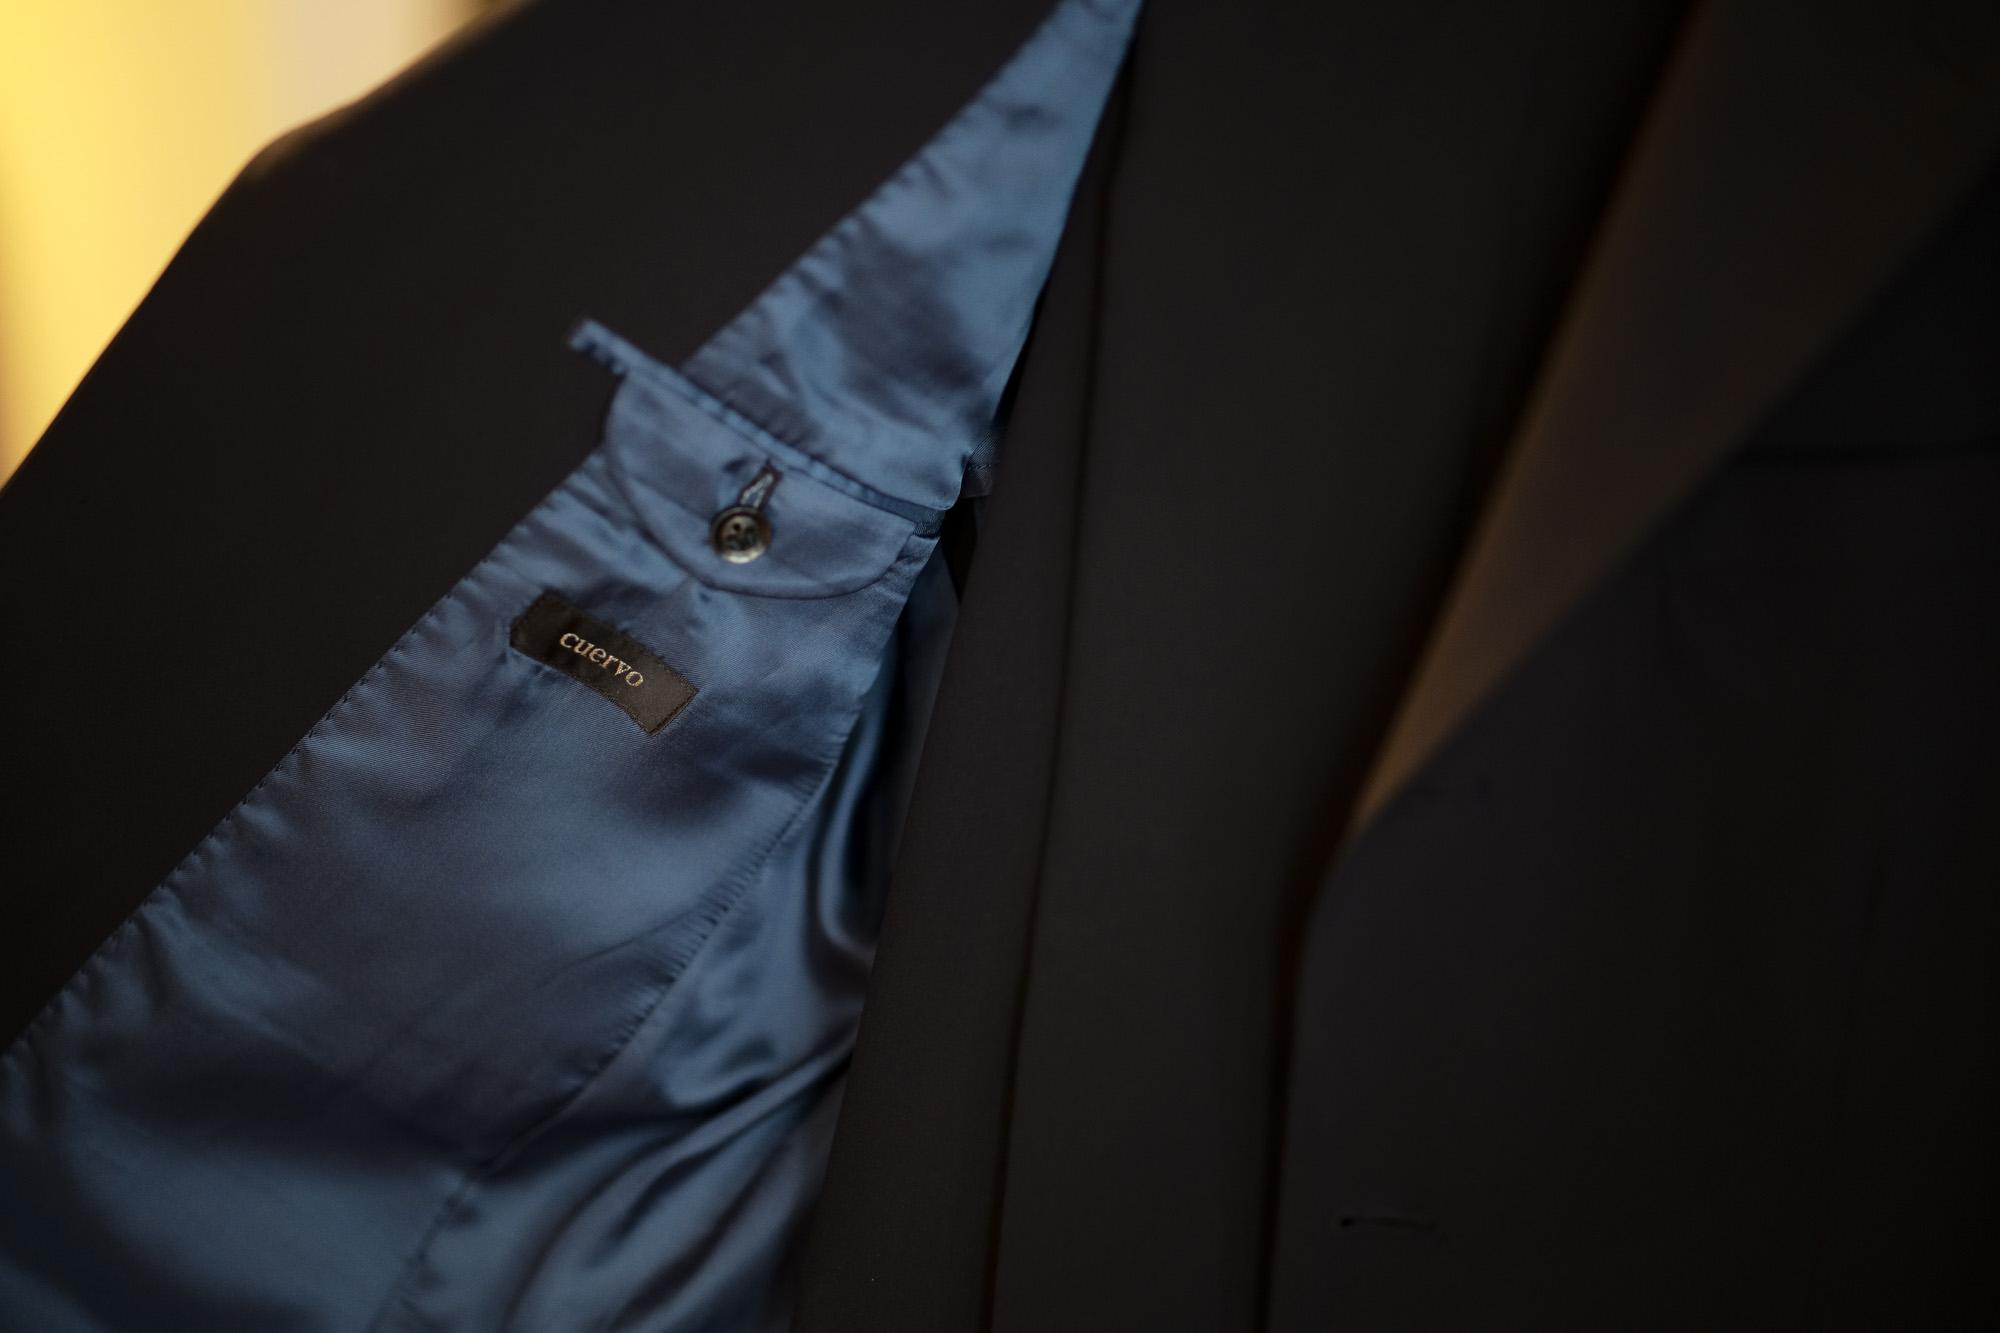 Cuervo (クエルボ) Sartoria Collection (サルトリア コレクション) Rooster (ルースター) STRETCH NYLON ストレッチナイロン スーツ NAVY (ネイビー) MADE IN JAPAN (日本製) 2019【オーダー分入荷】愛知 名古屋 alto e diritto アルトエデリット